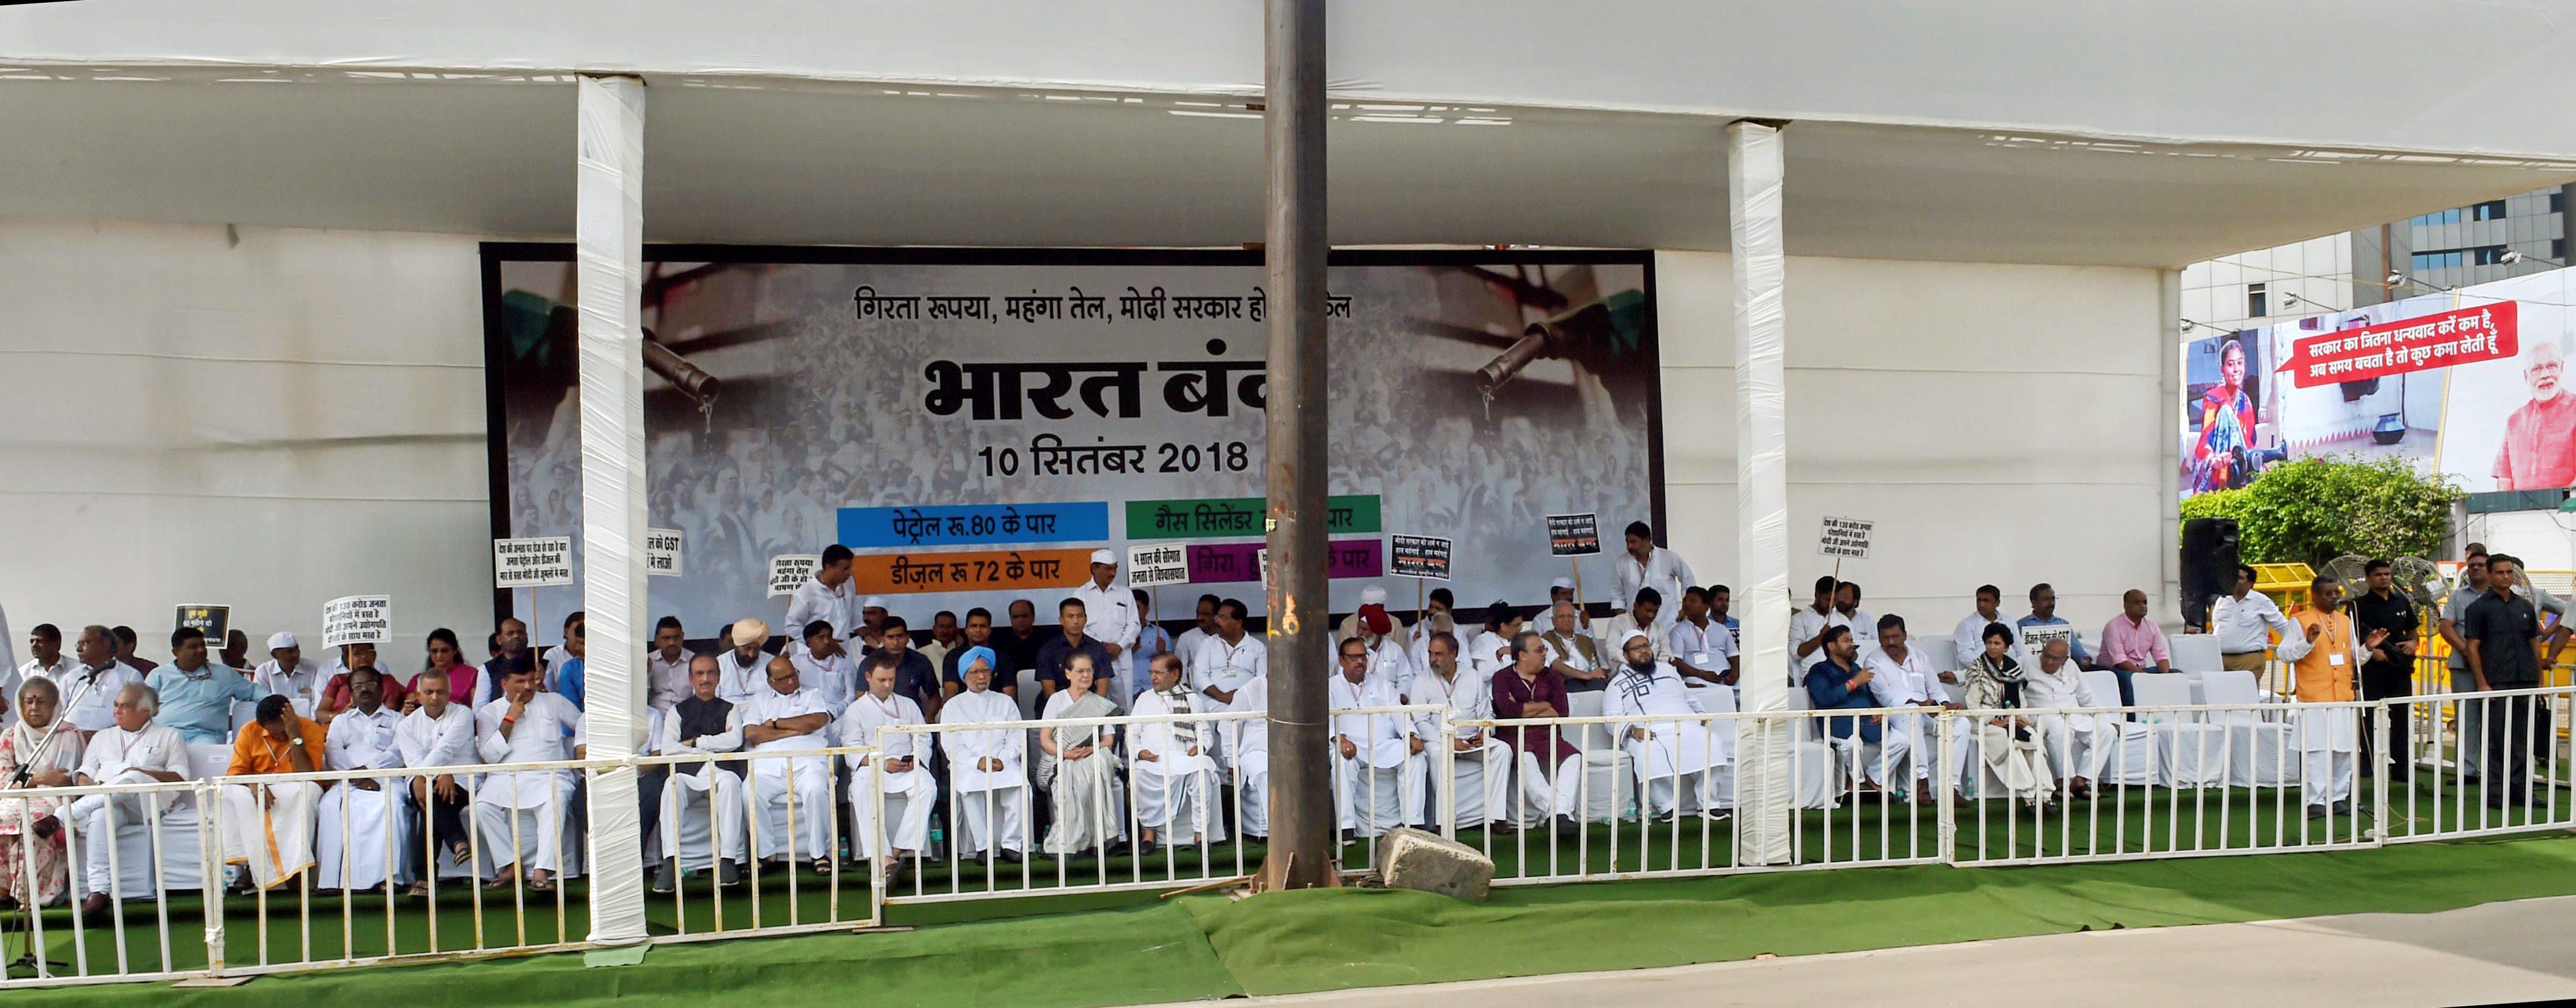 Rahul gandhi on bharat bandh